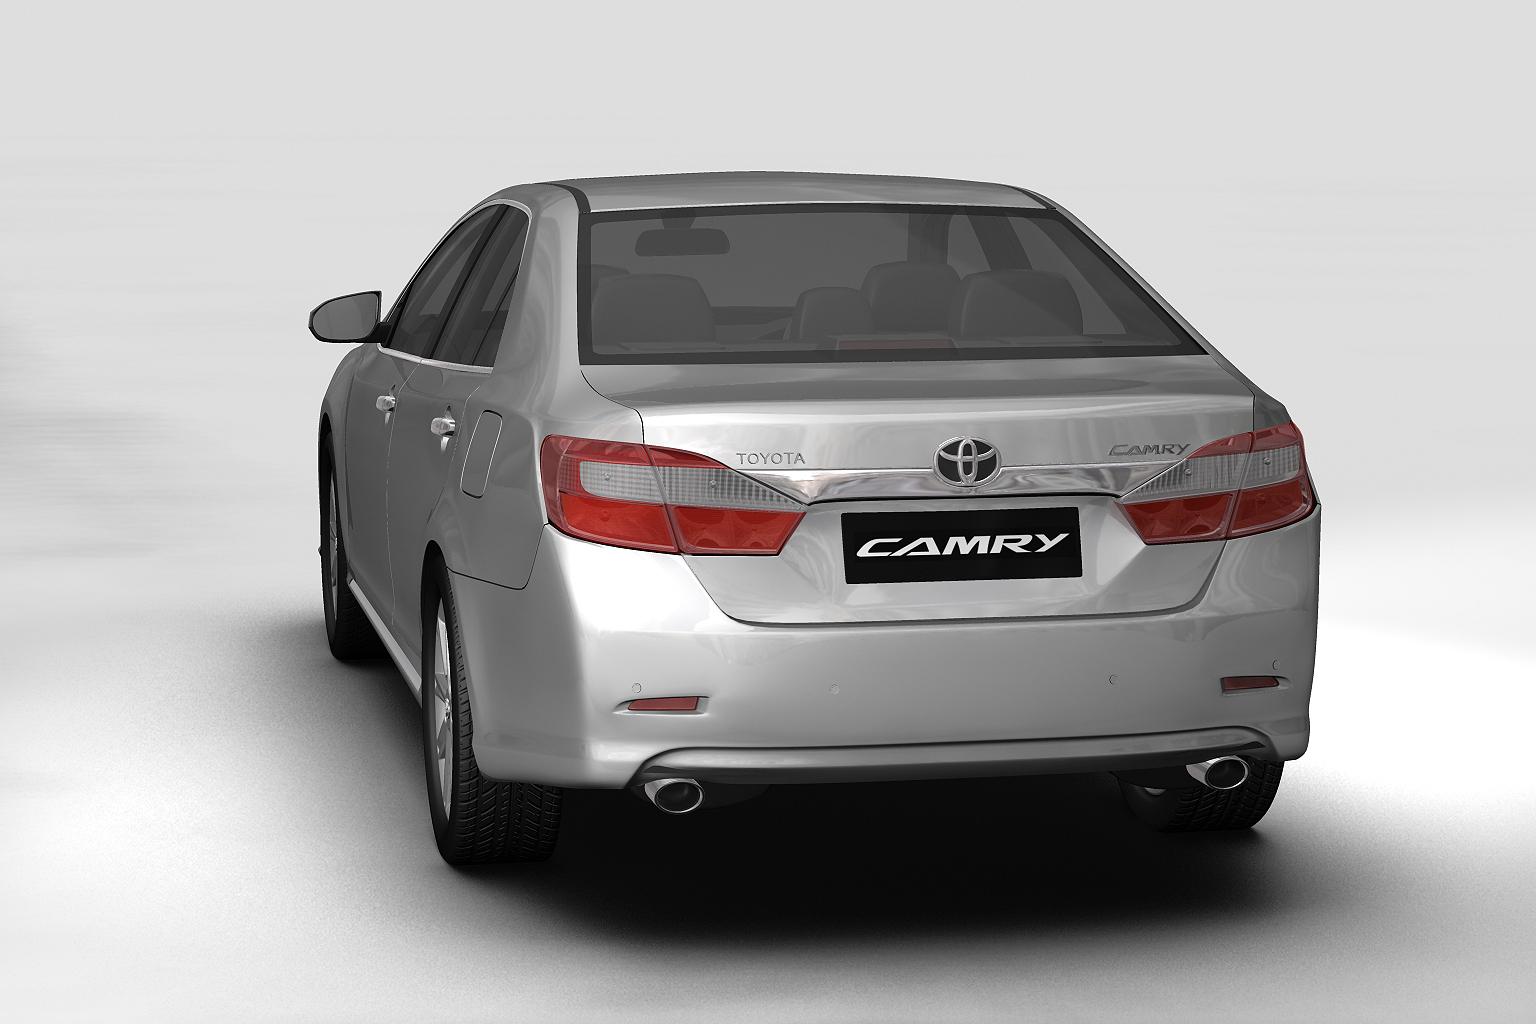 2012 toyota camry (asian) Model 3d 3ds max fbx c4d lwo hrc xsi obj 136200